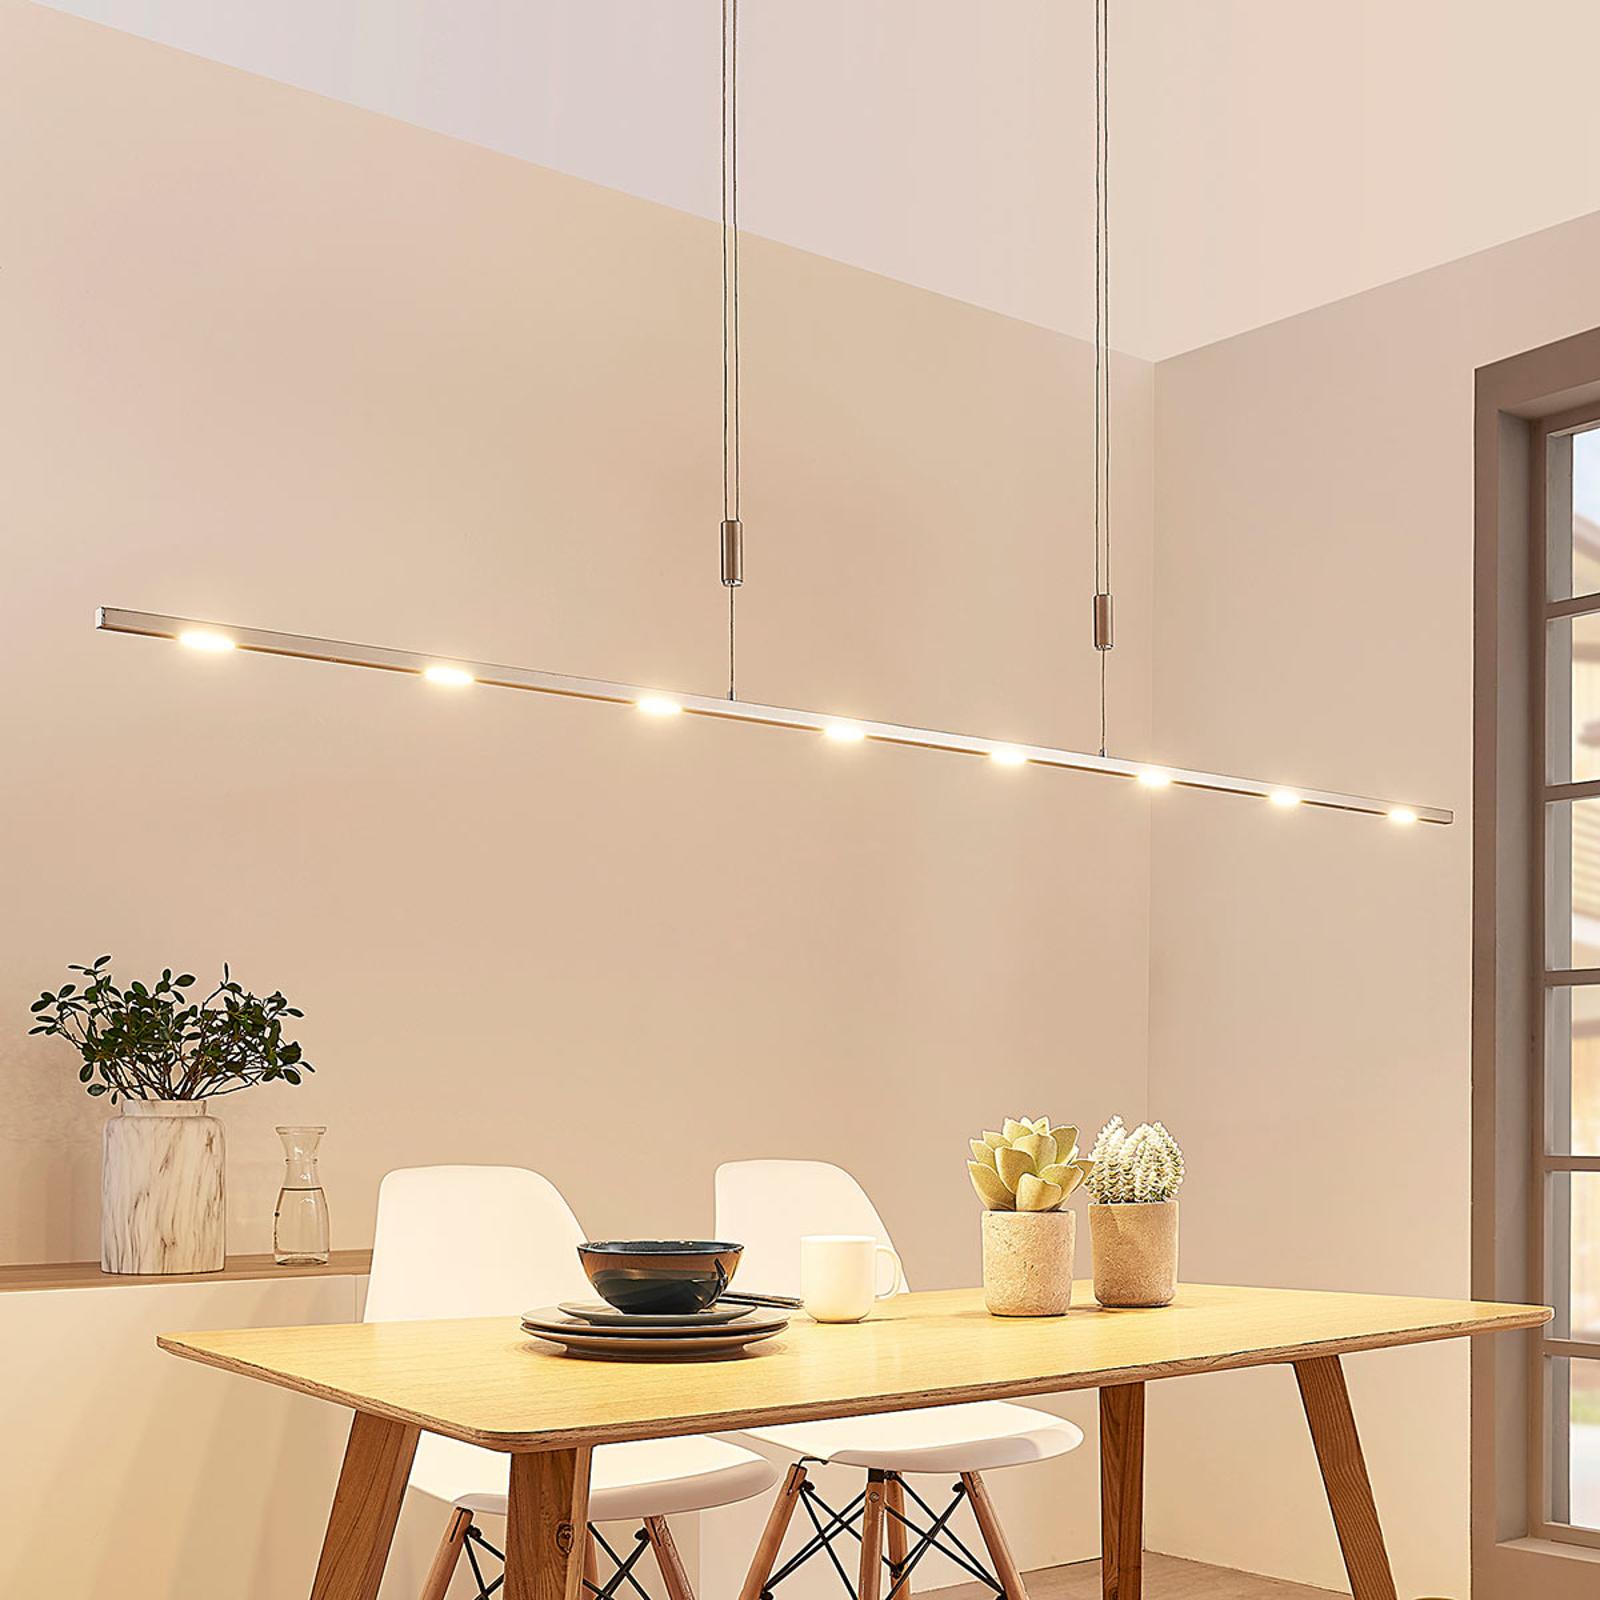 LED hanglamp Arnik, dimbaar, 180 cm